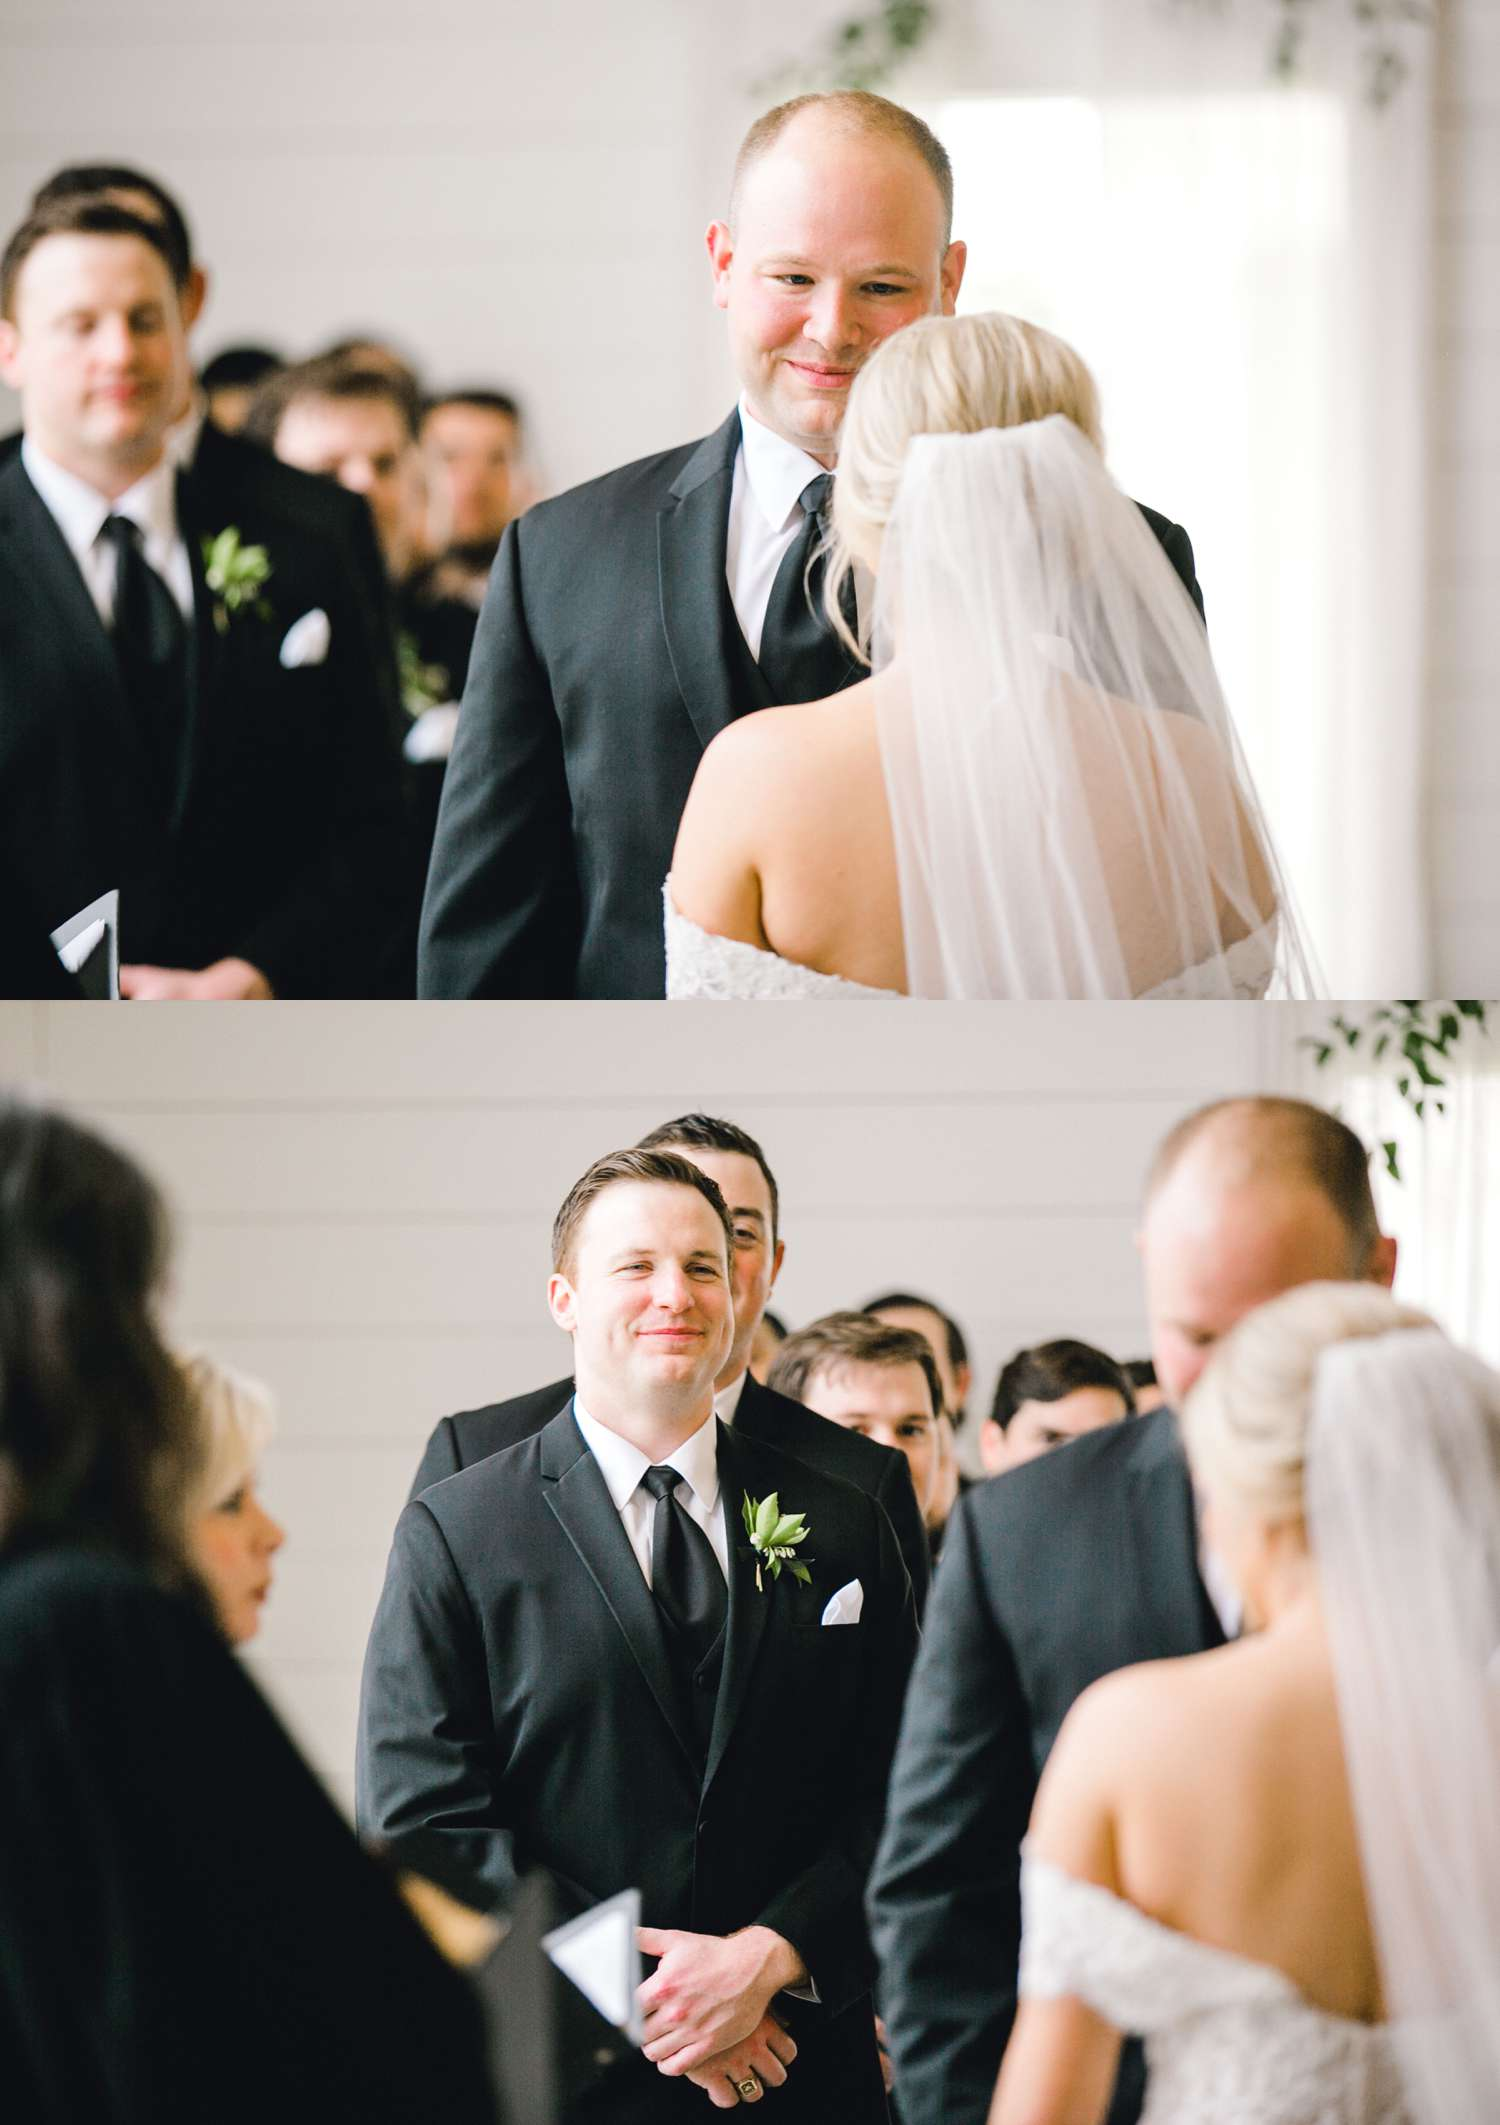 HEBERT_MORGAN_AND_CLAY_ALLEEJ_THE_FARMHOUSE_MONTGOMERY_TEXAS_WEDDING_0102.jpg